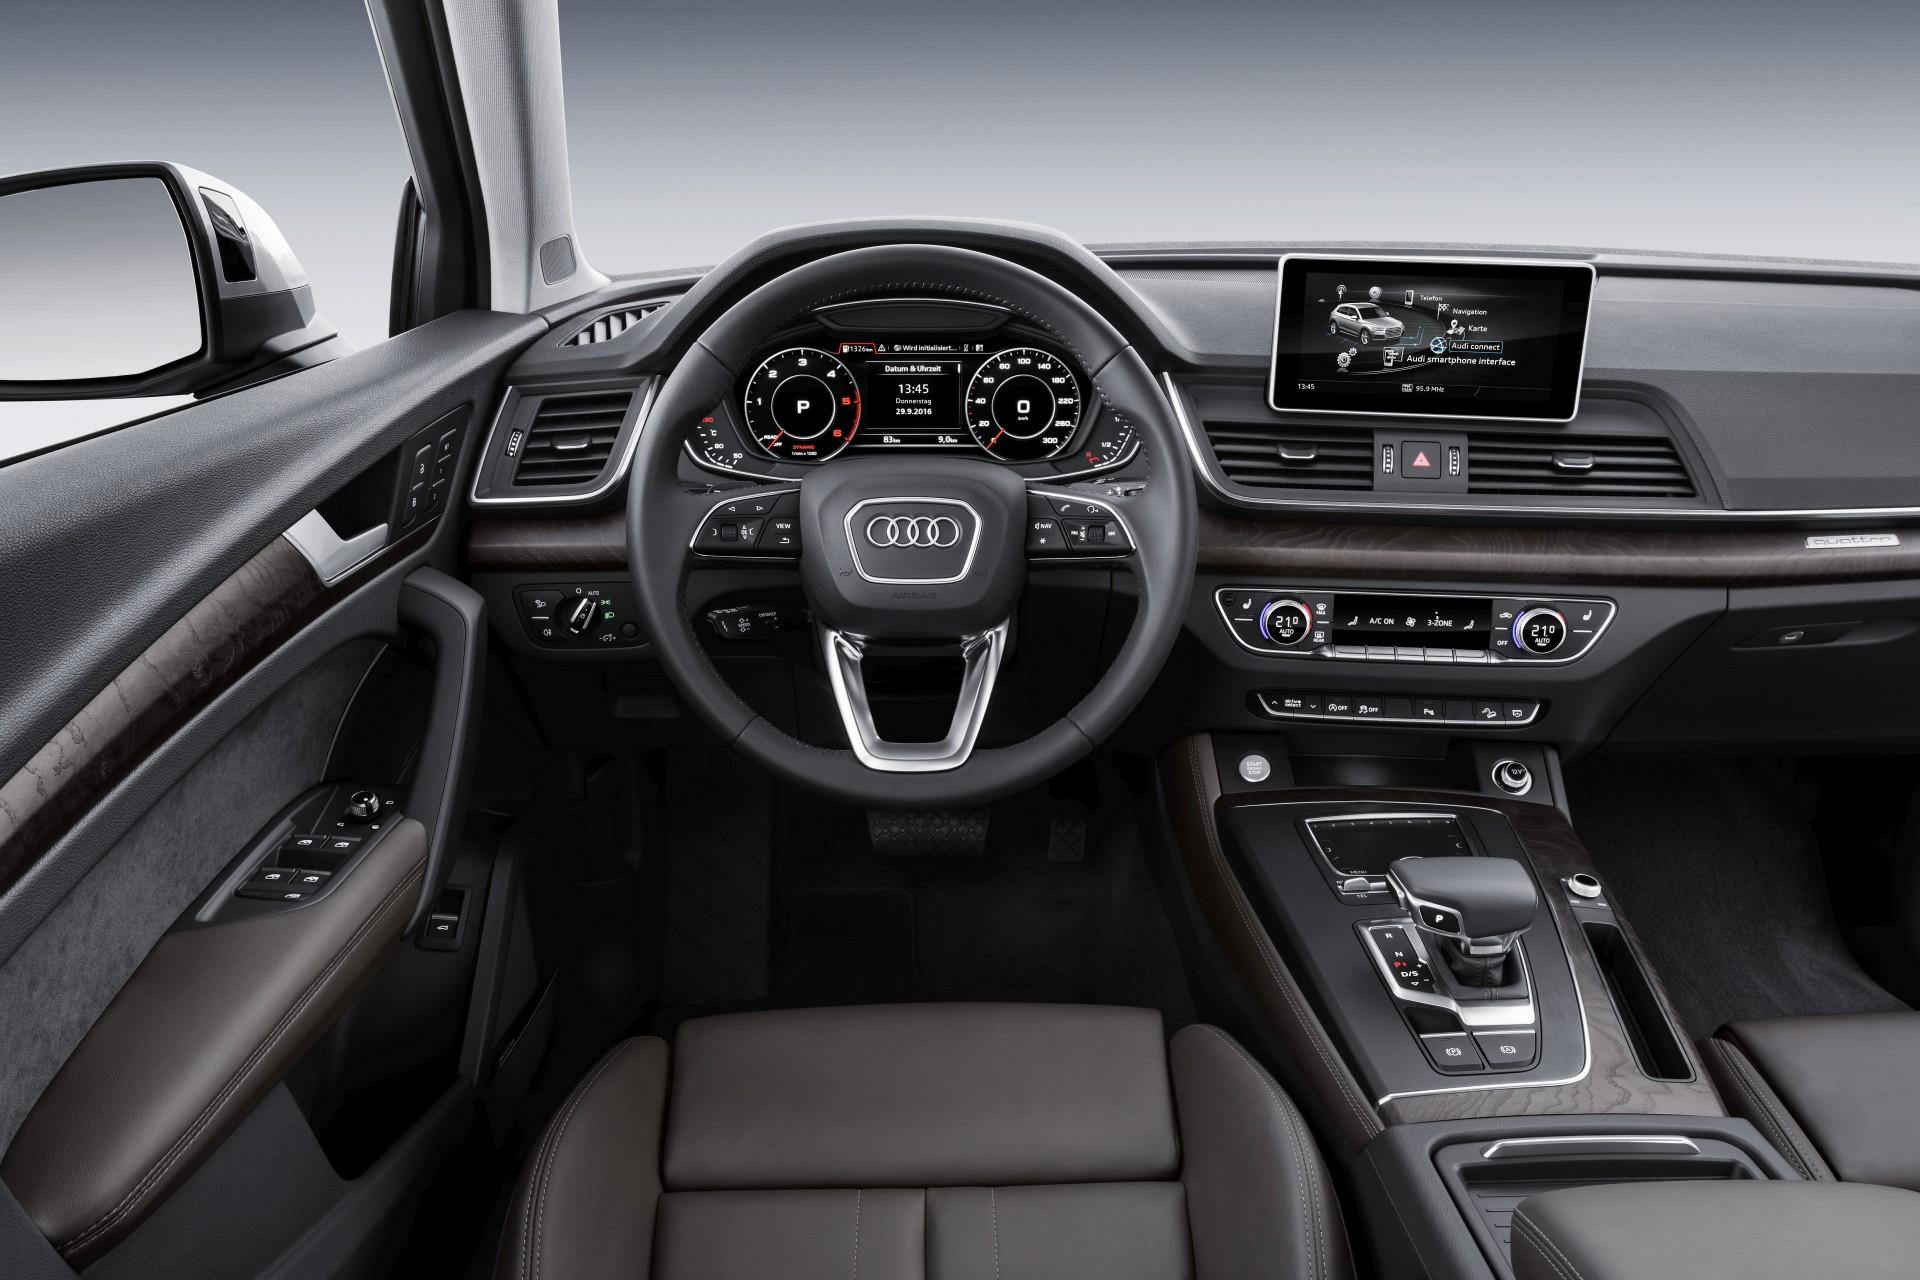 Audi Q5 - Innenraum Cockpit - Bild: Sandra Schink